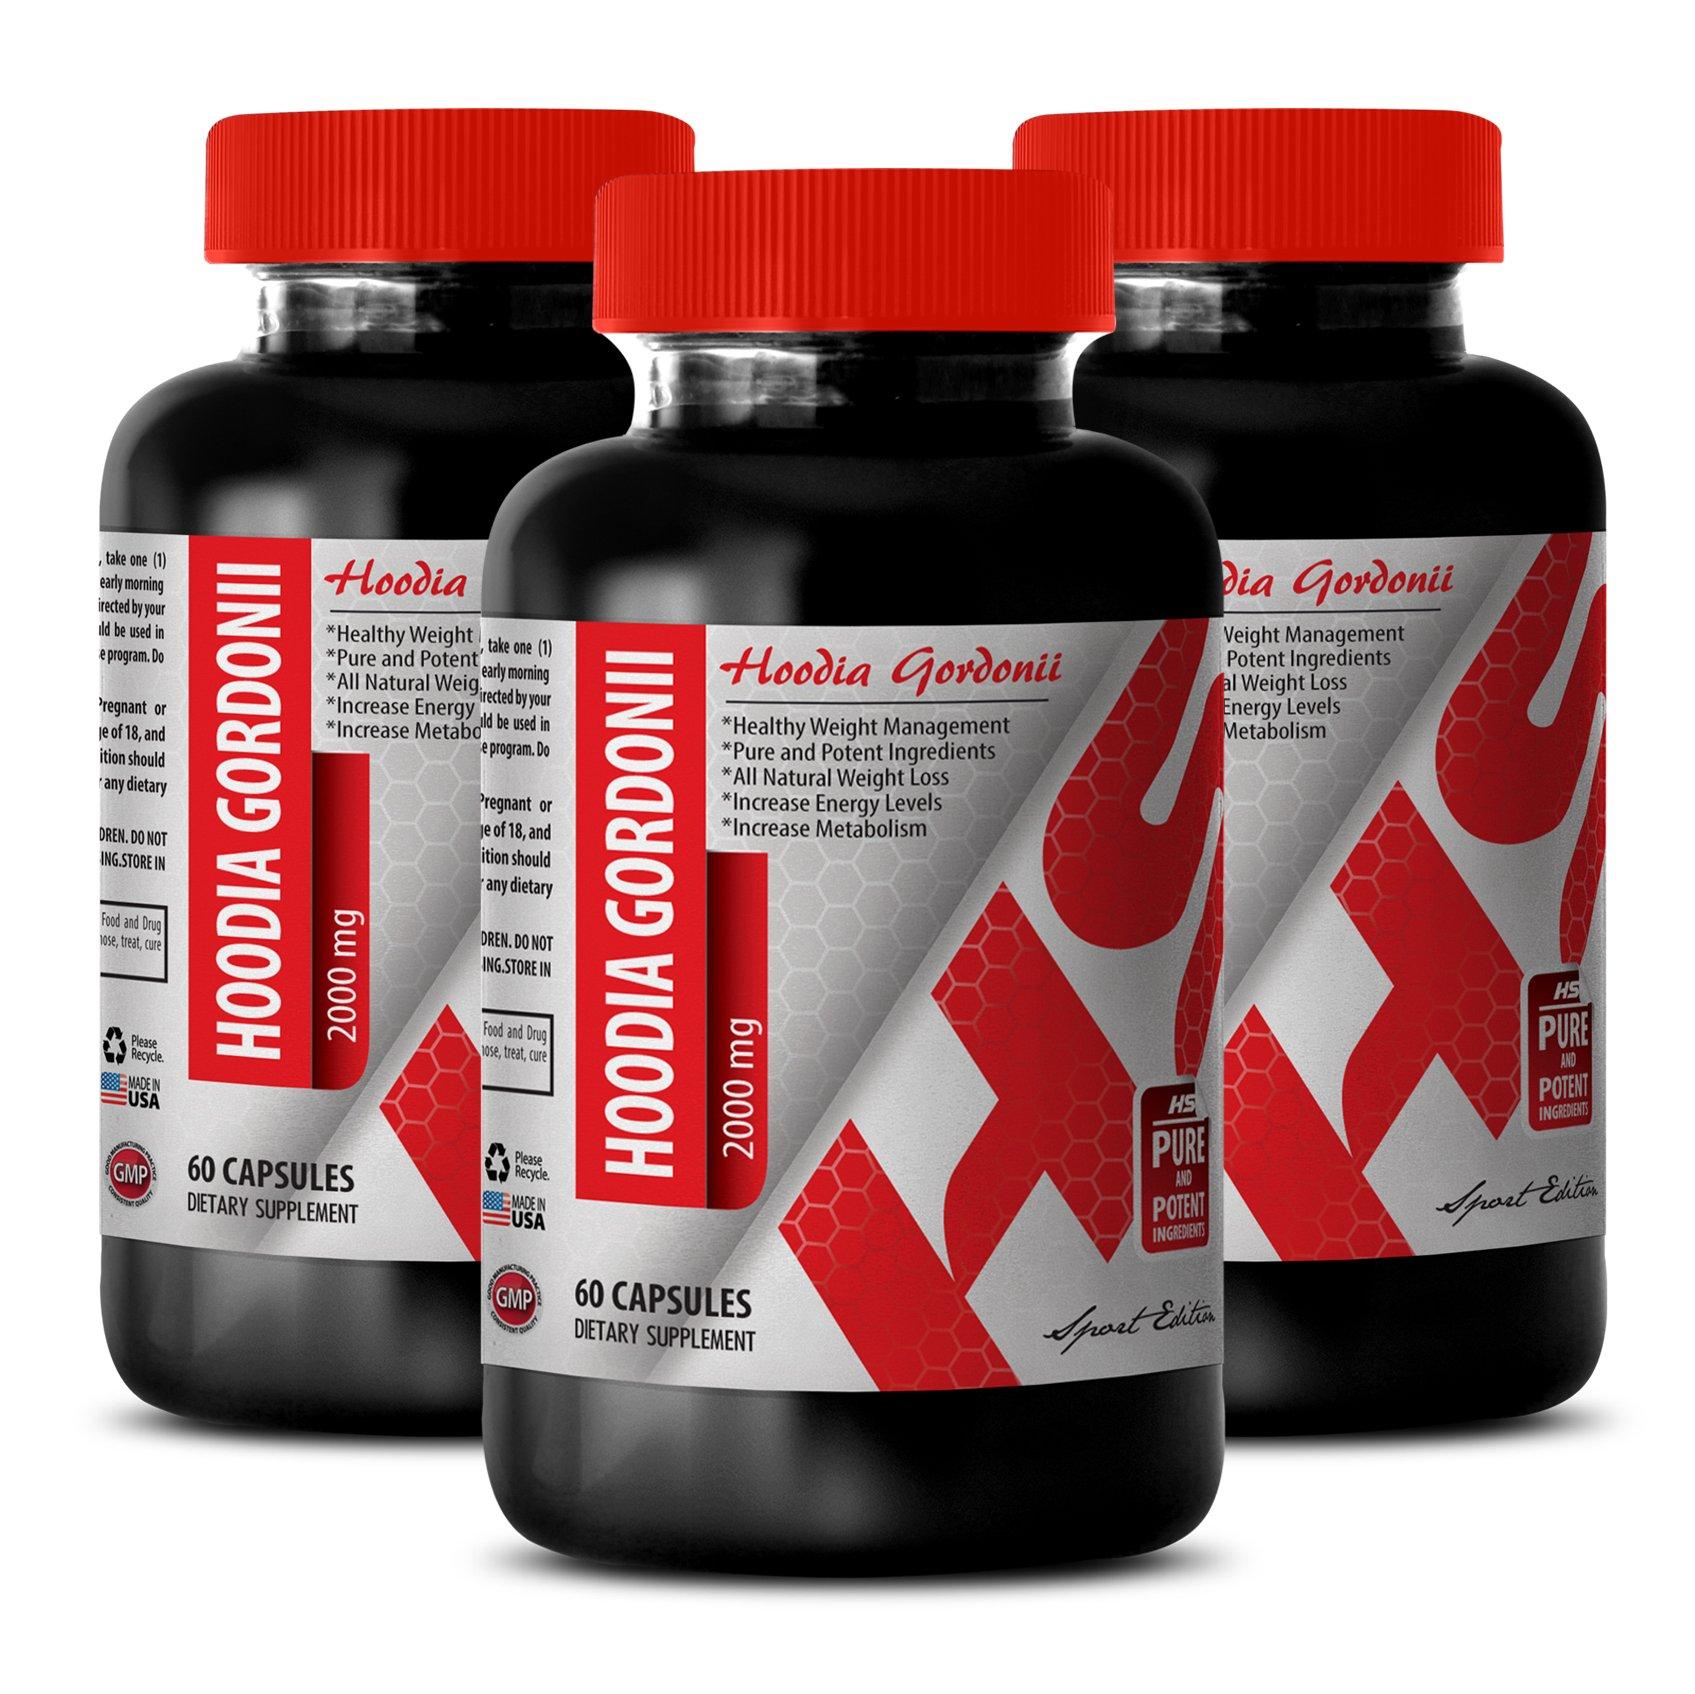 Hoodia supplement - HOODIA GORDONII POWDER 2000 MG - fat burner (3 Bottles)